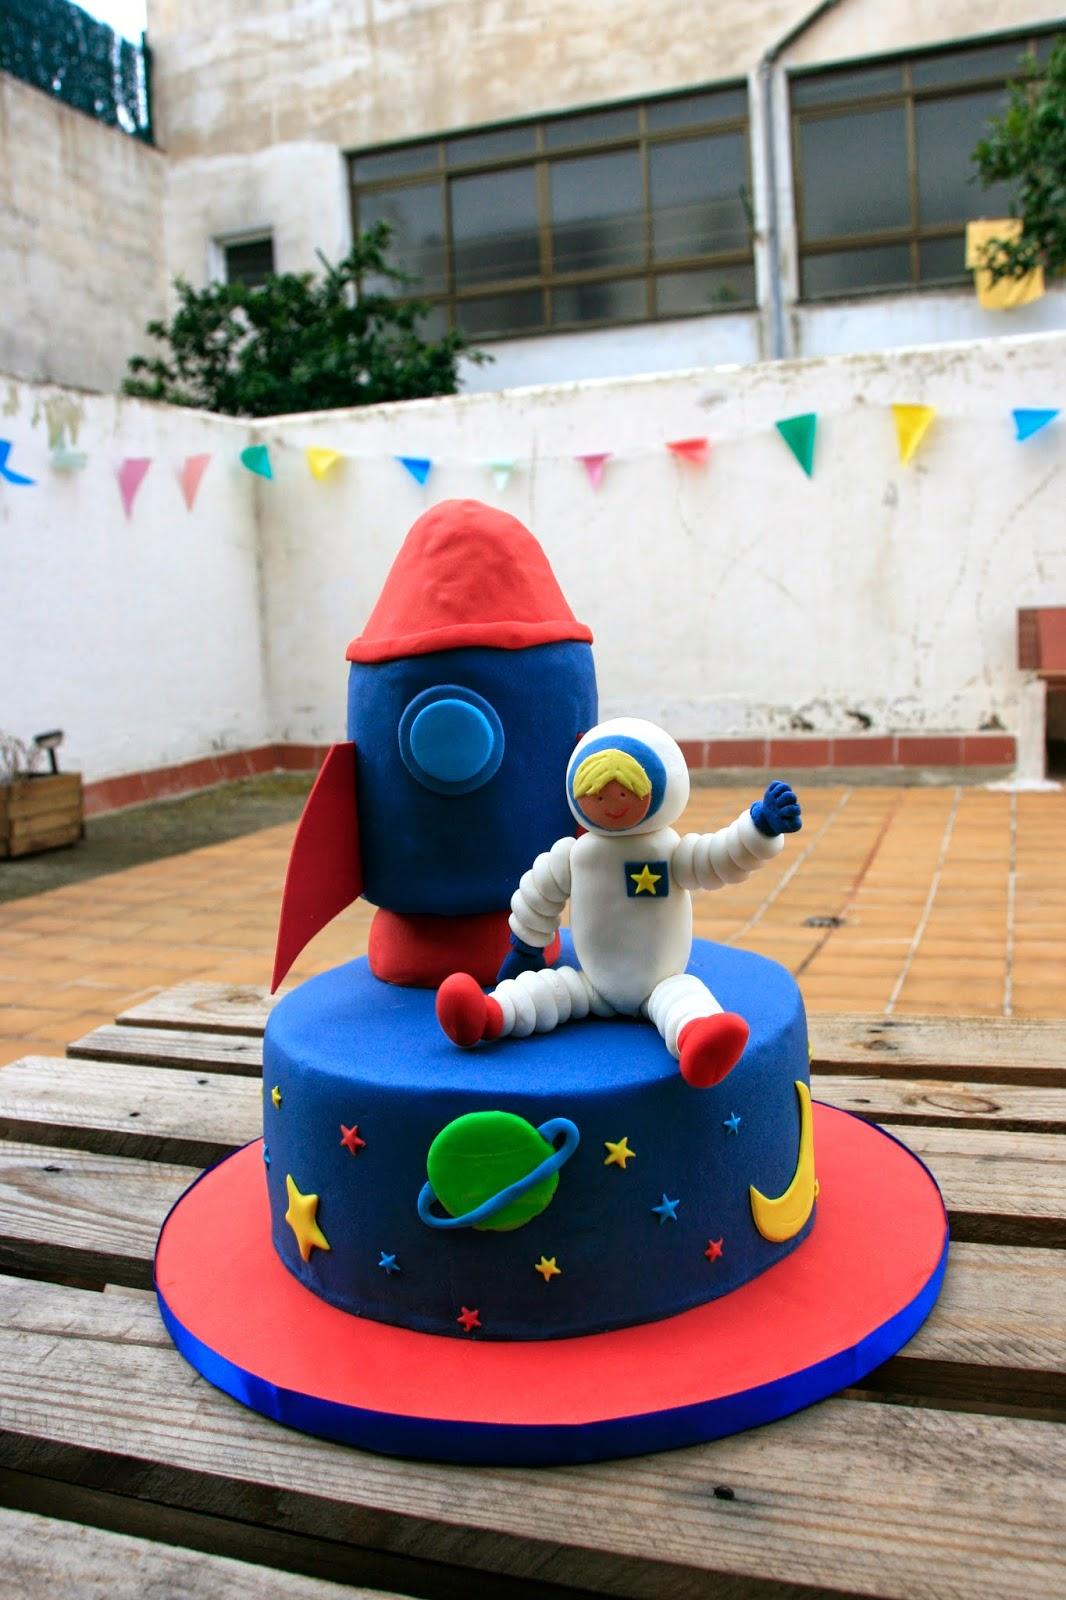 Tarta decorada amb cohet i astronauta